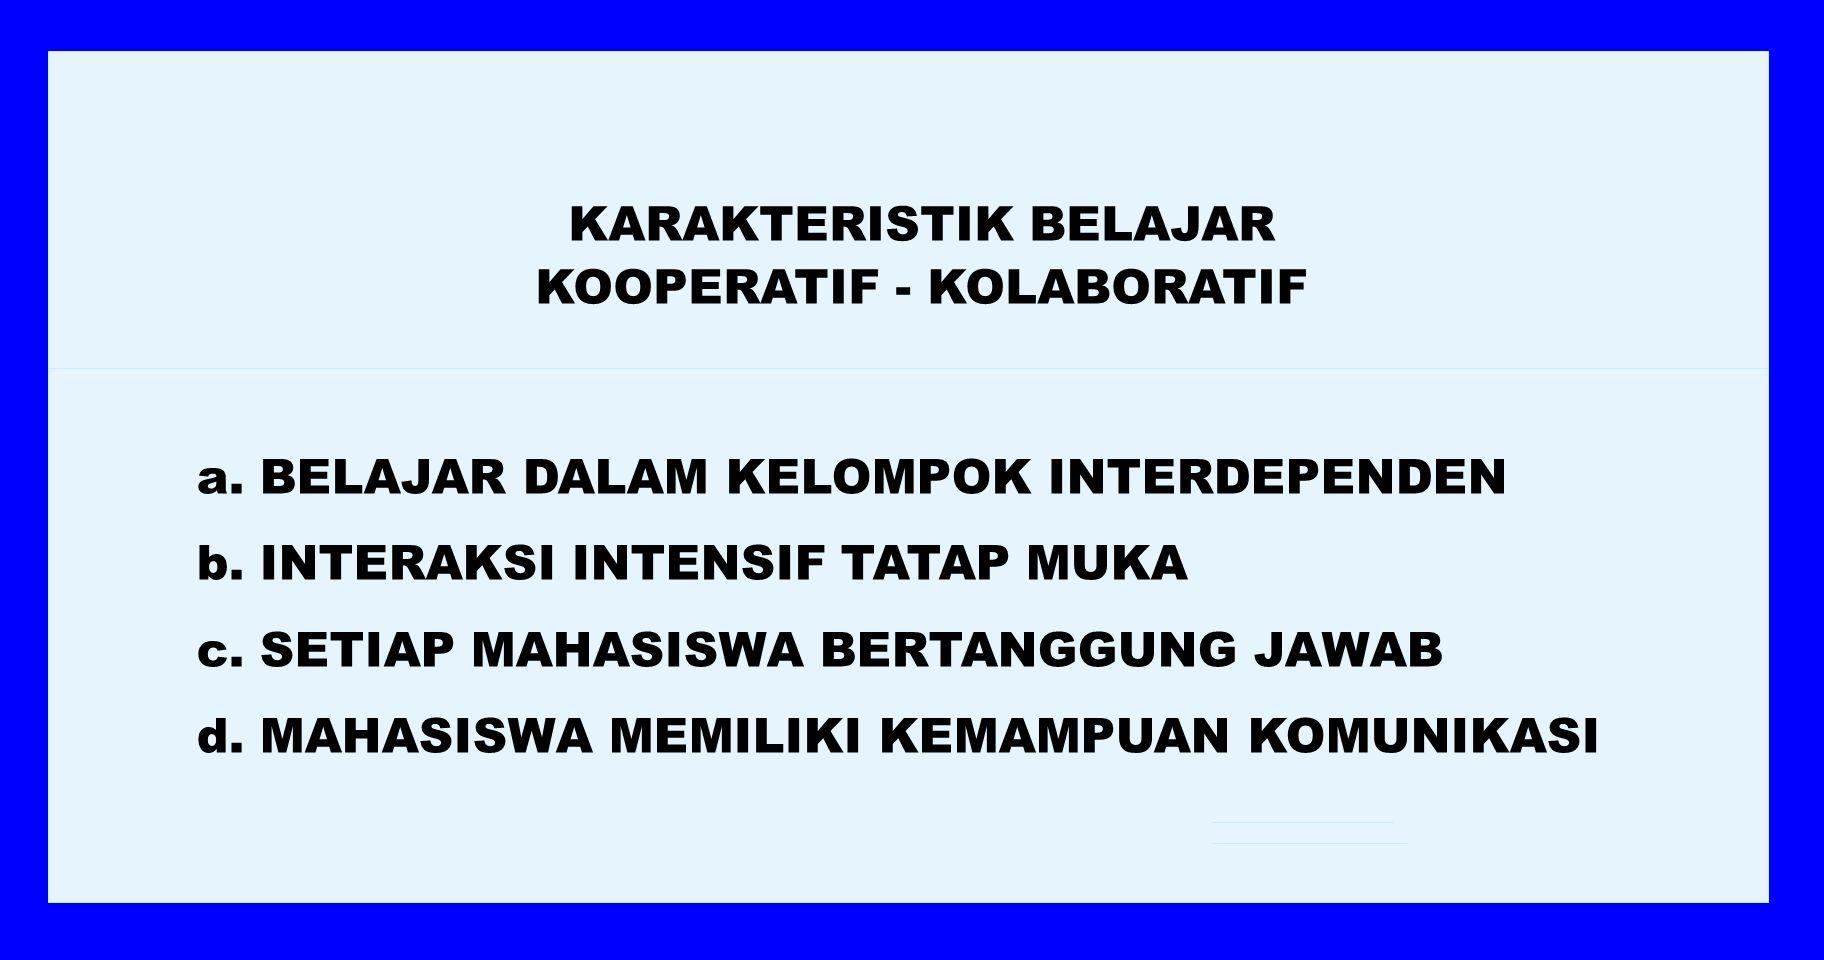 KARAKTERISTIK BELAJAR KOOPERATIF - KOLABORATIF